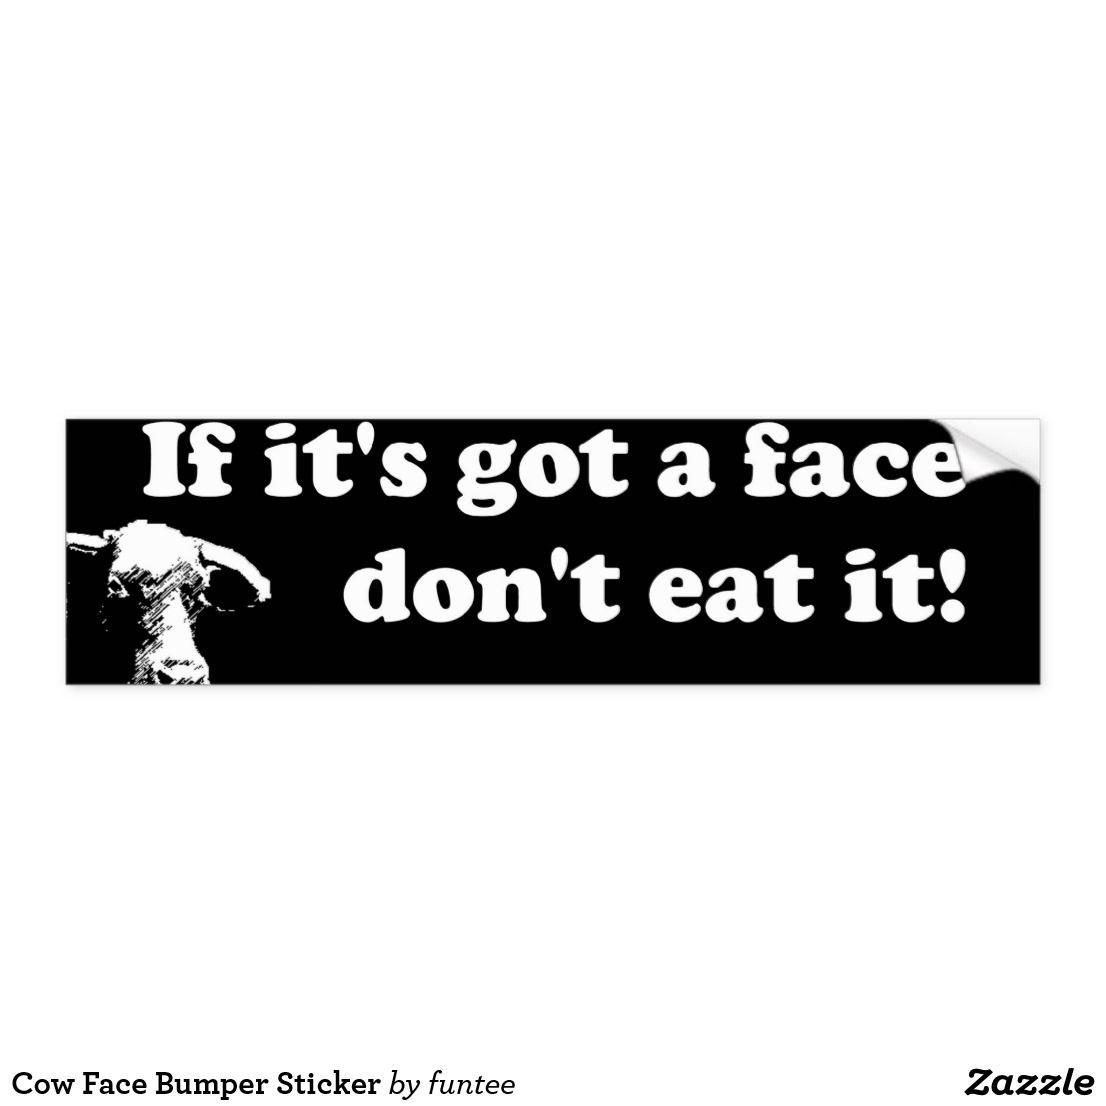 Cow Face Bumper Sticker